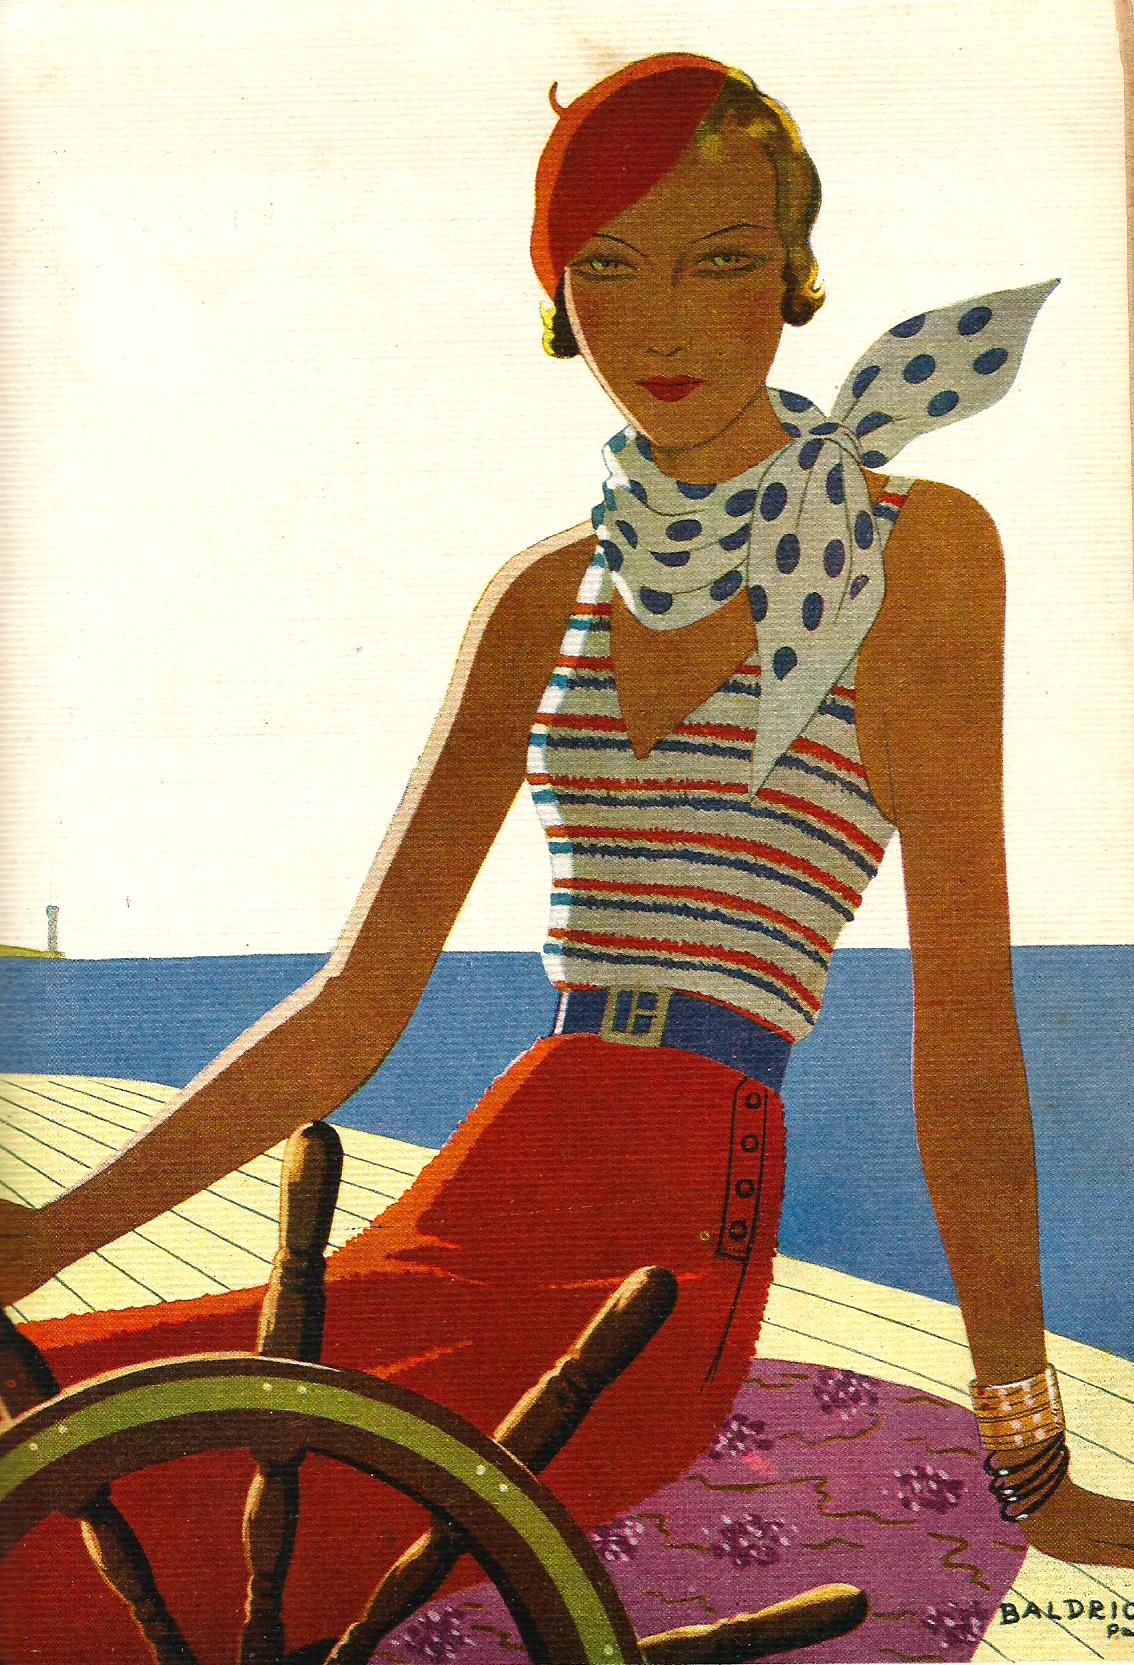 Balandrista. 1934. Baldrich